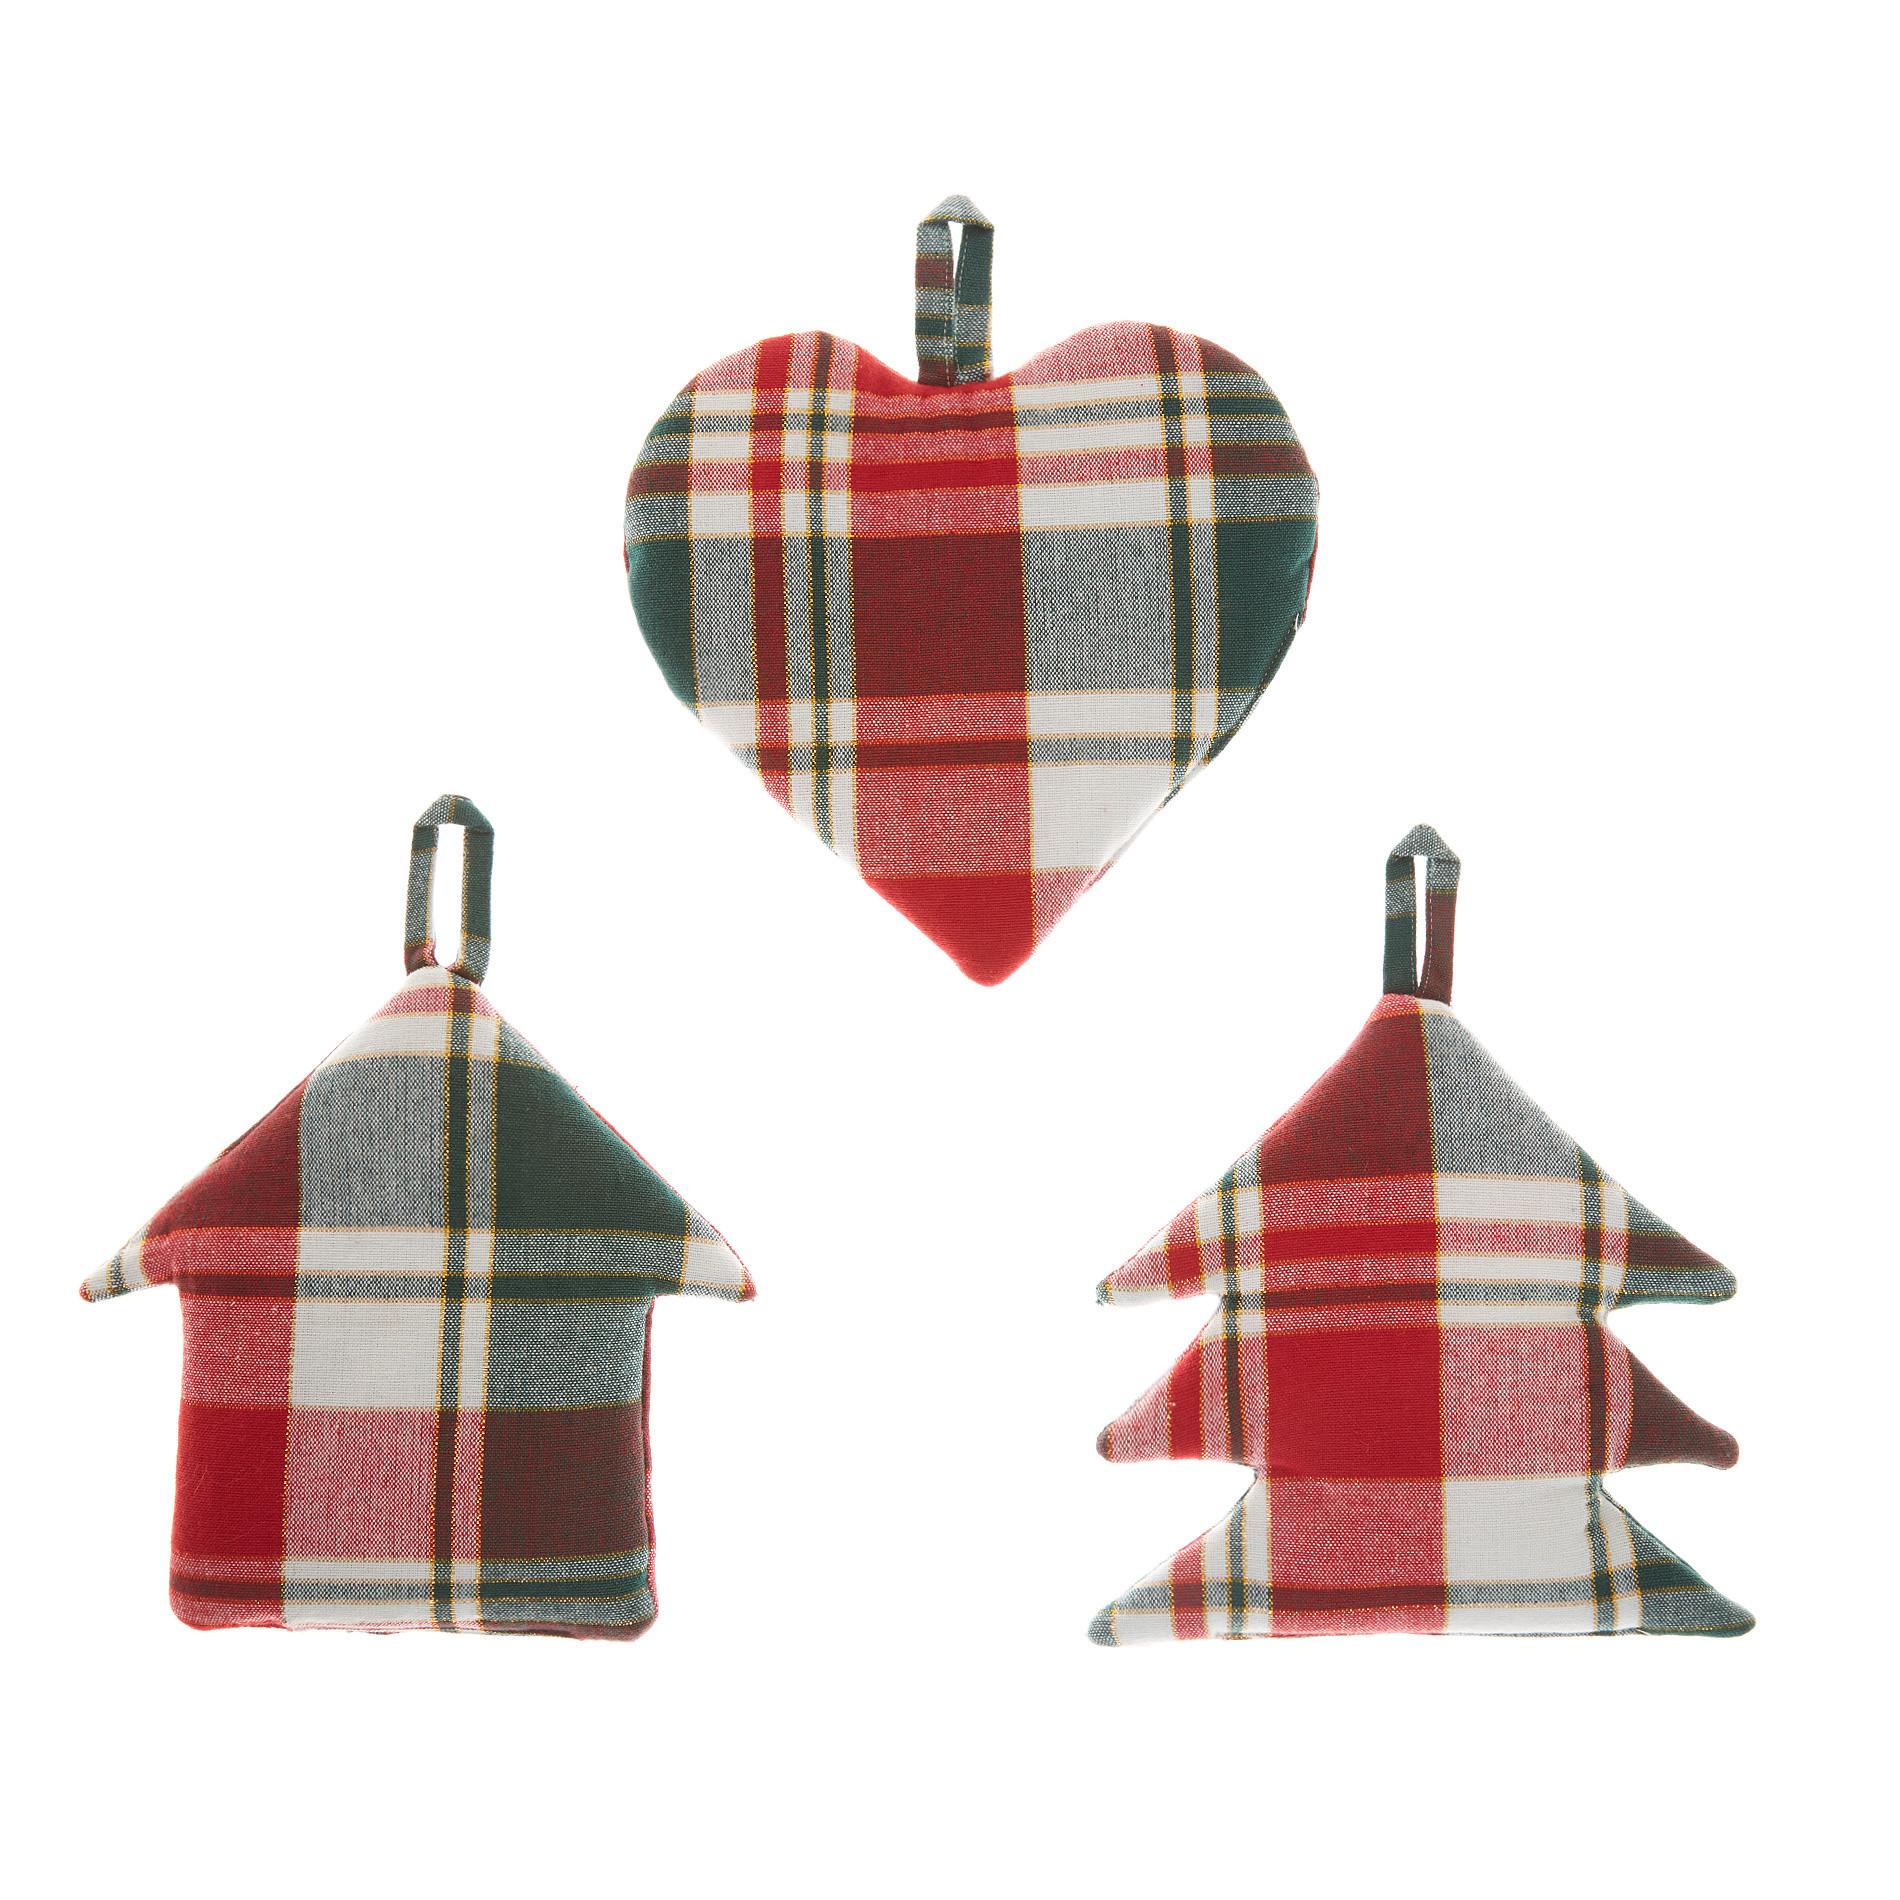 Set 3 decorazioni twill di cotone tartan e fili lurex, Verde/Rosso, large image number 0